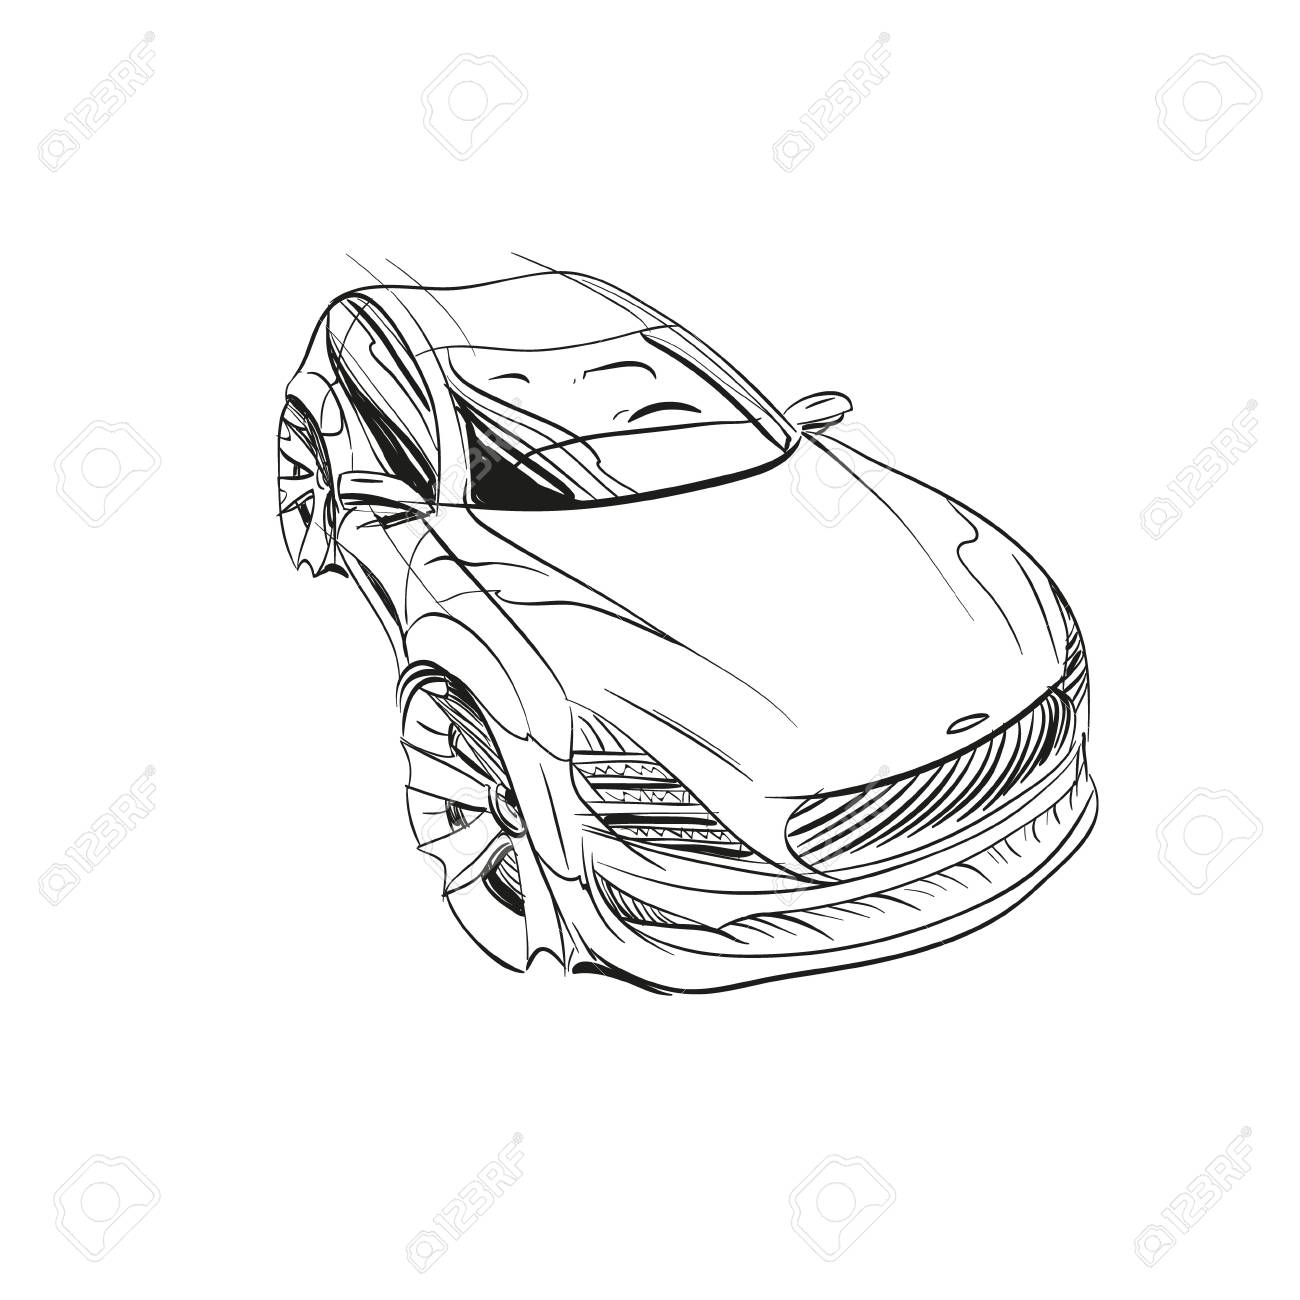 Car Concept Car Sketch Vector Hand Drawn Autodesign Automobile